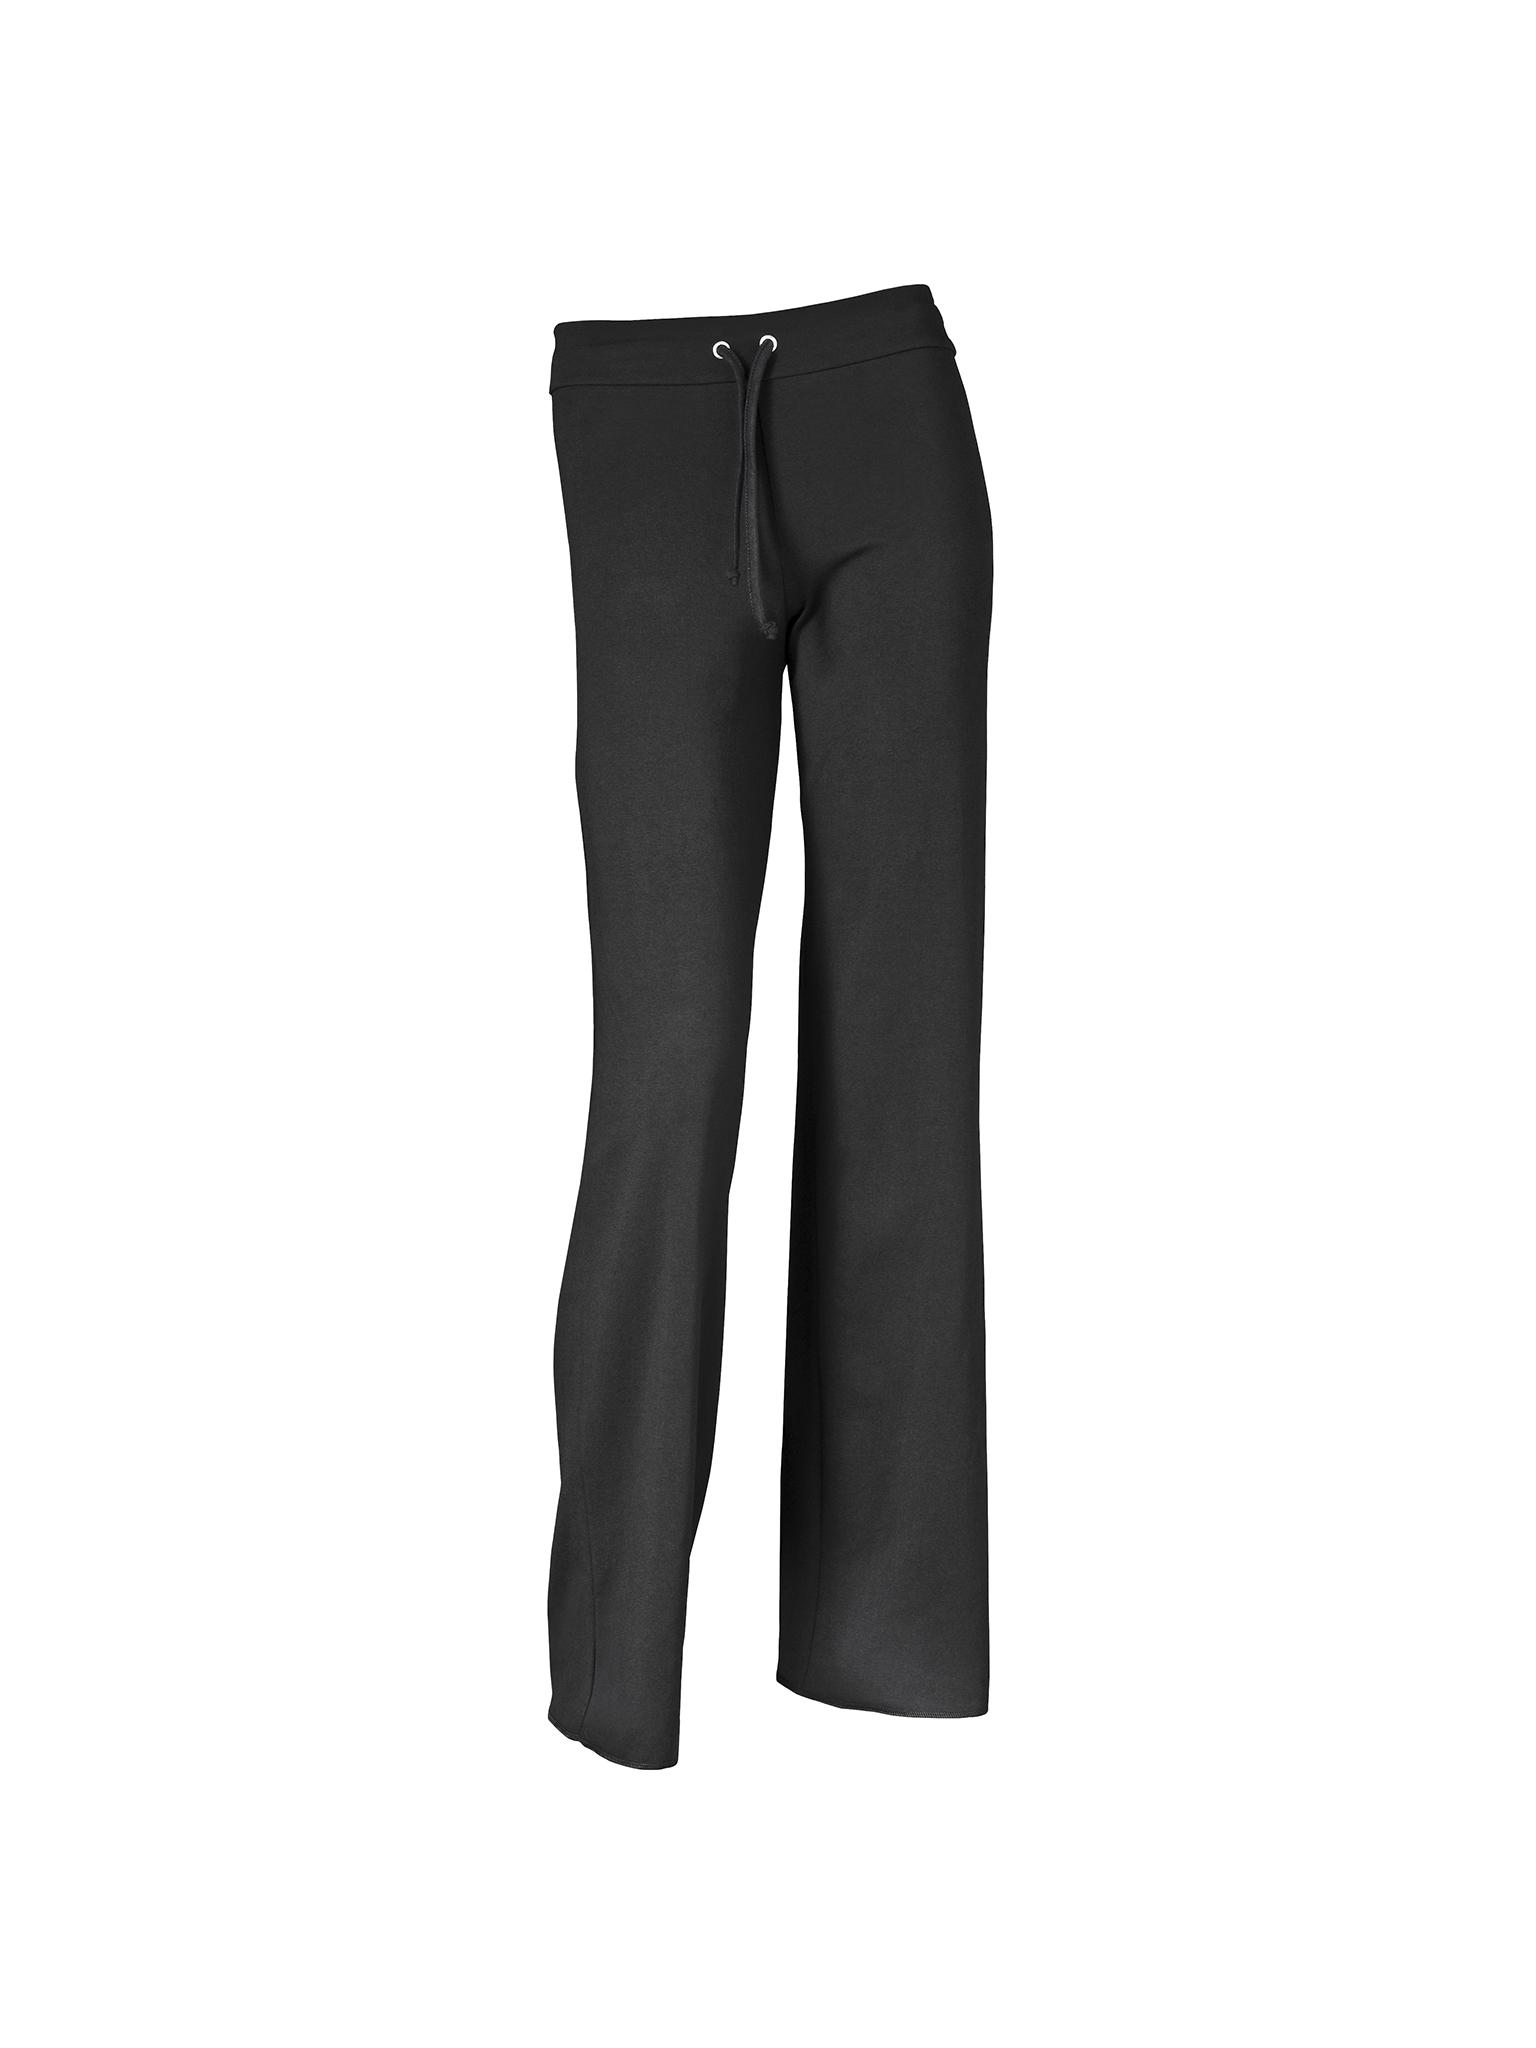 Image of   Papillon Pant waistband drawstring cotton Women - Black - L